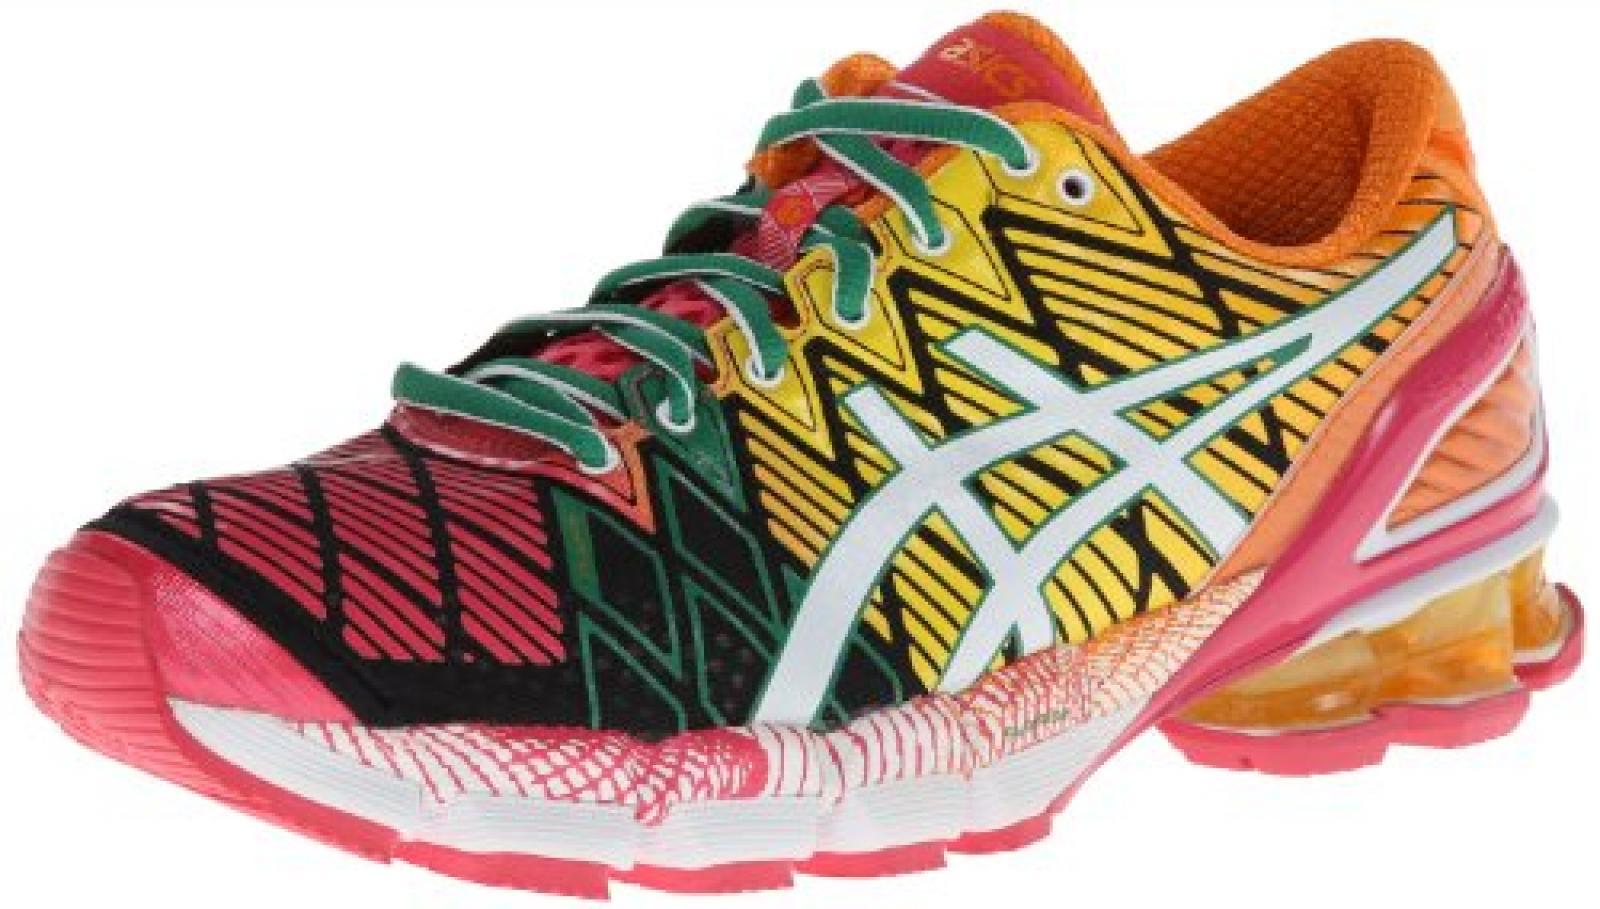 Asics - Frauen-Gel-Kinsei 5 Schuhe, EUR: 44, Black/White/Pink